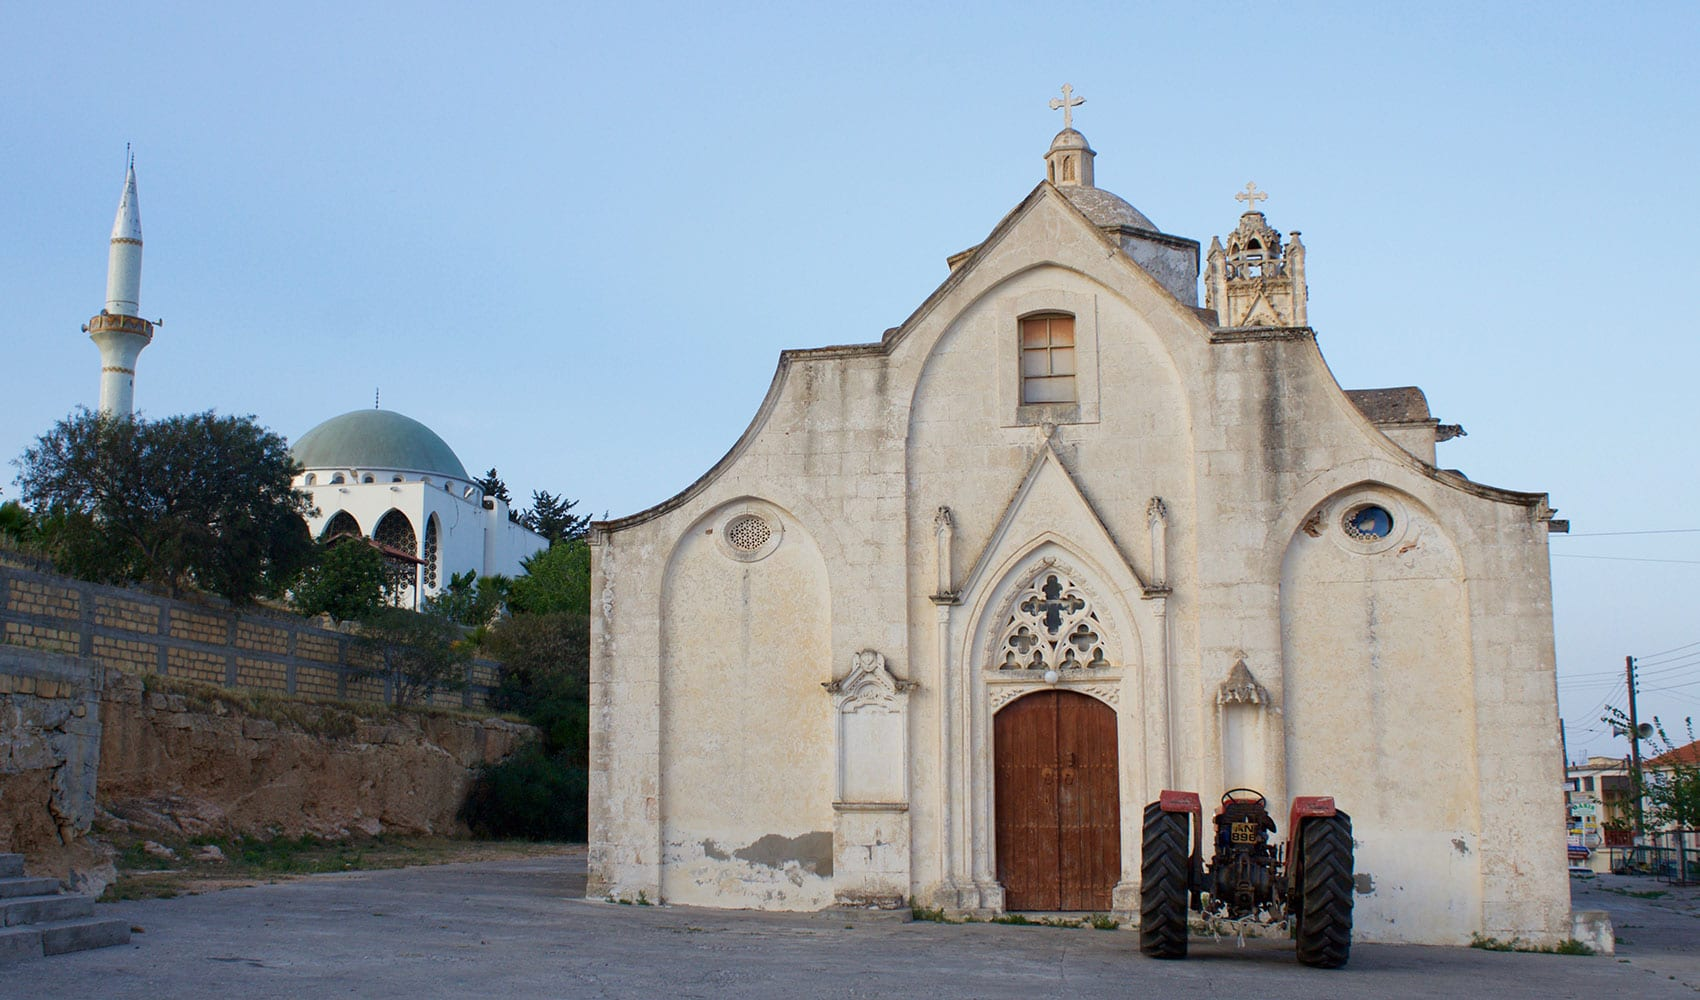 Greek Orthodox church sits near a Muslim mosque in the town of Rizokarpaso